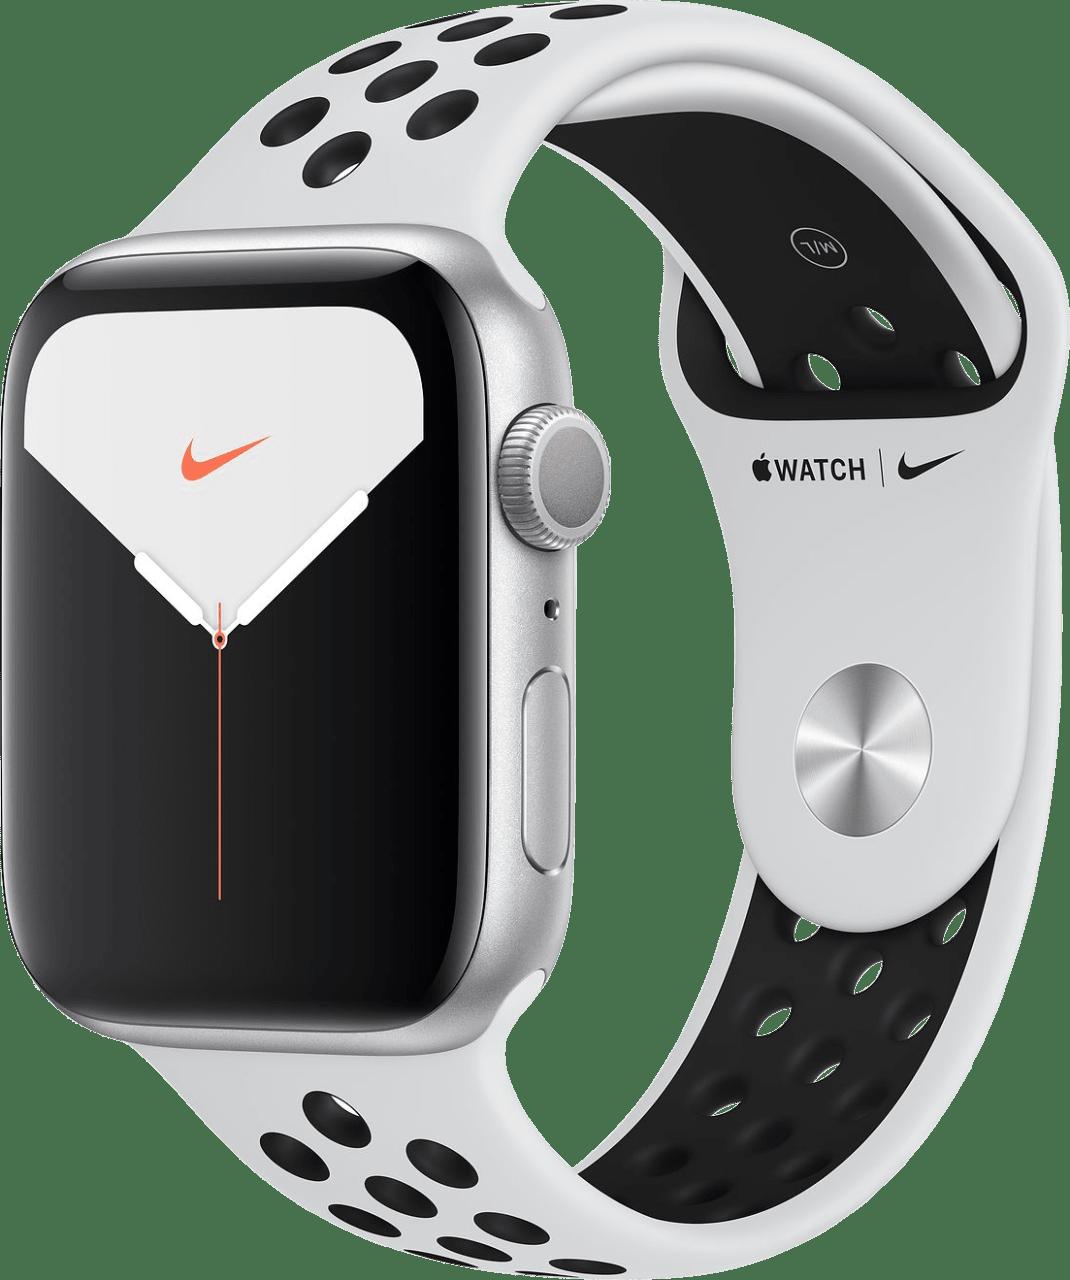 Reines Platin / Schwarz Apple Watch Nike Serie 5 GPS + Cellular, 44mm Aluminium-Gehäuse, Sportarmband.2